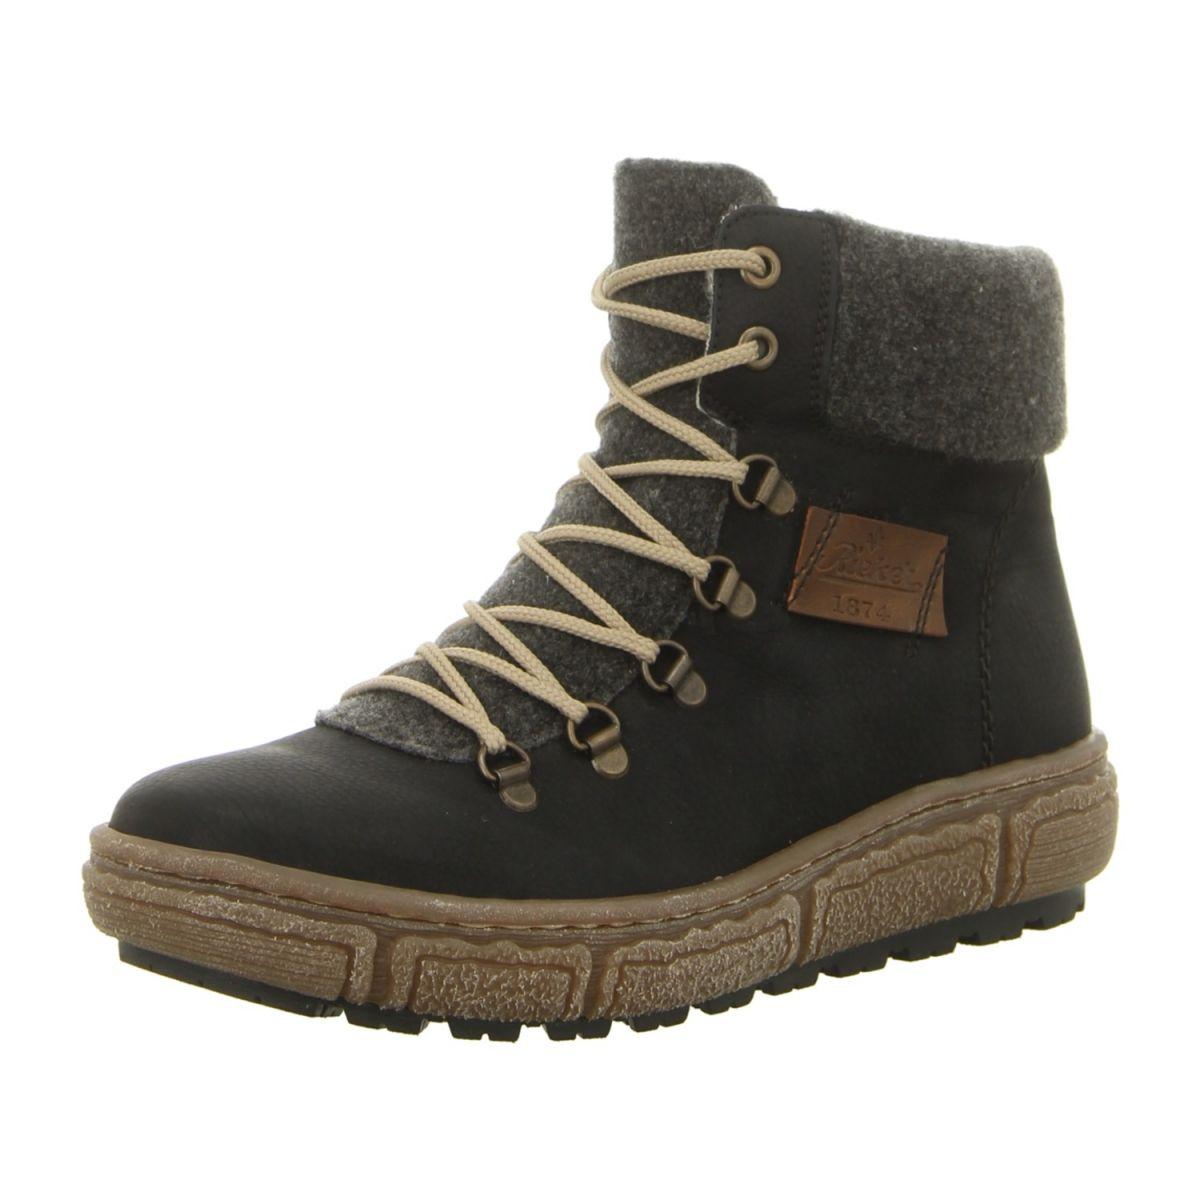 NEU  Rieker Stiefeletten Z7943-00 - schwarz kombi -   Schuhe ... 6b23255451